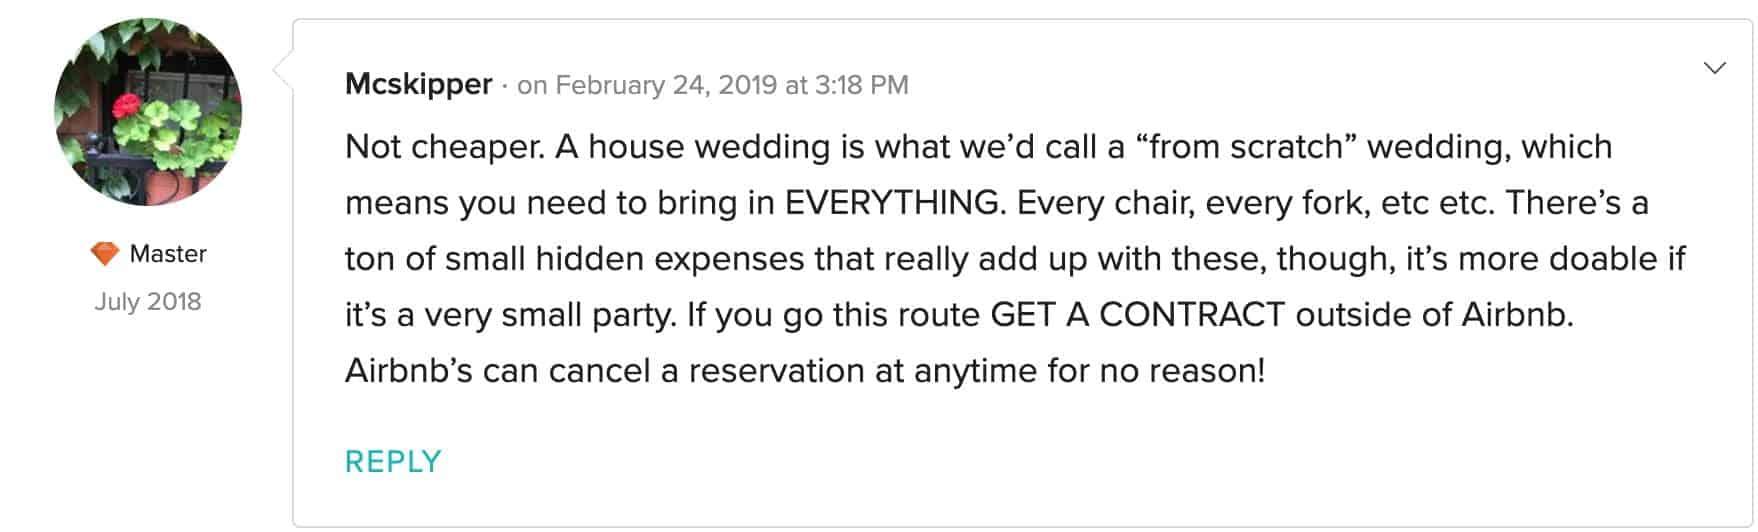 3 airbnb wedding venue california